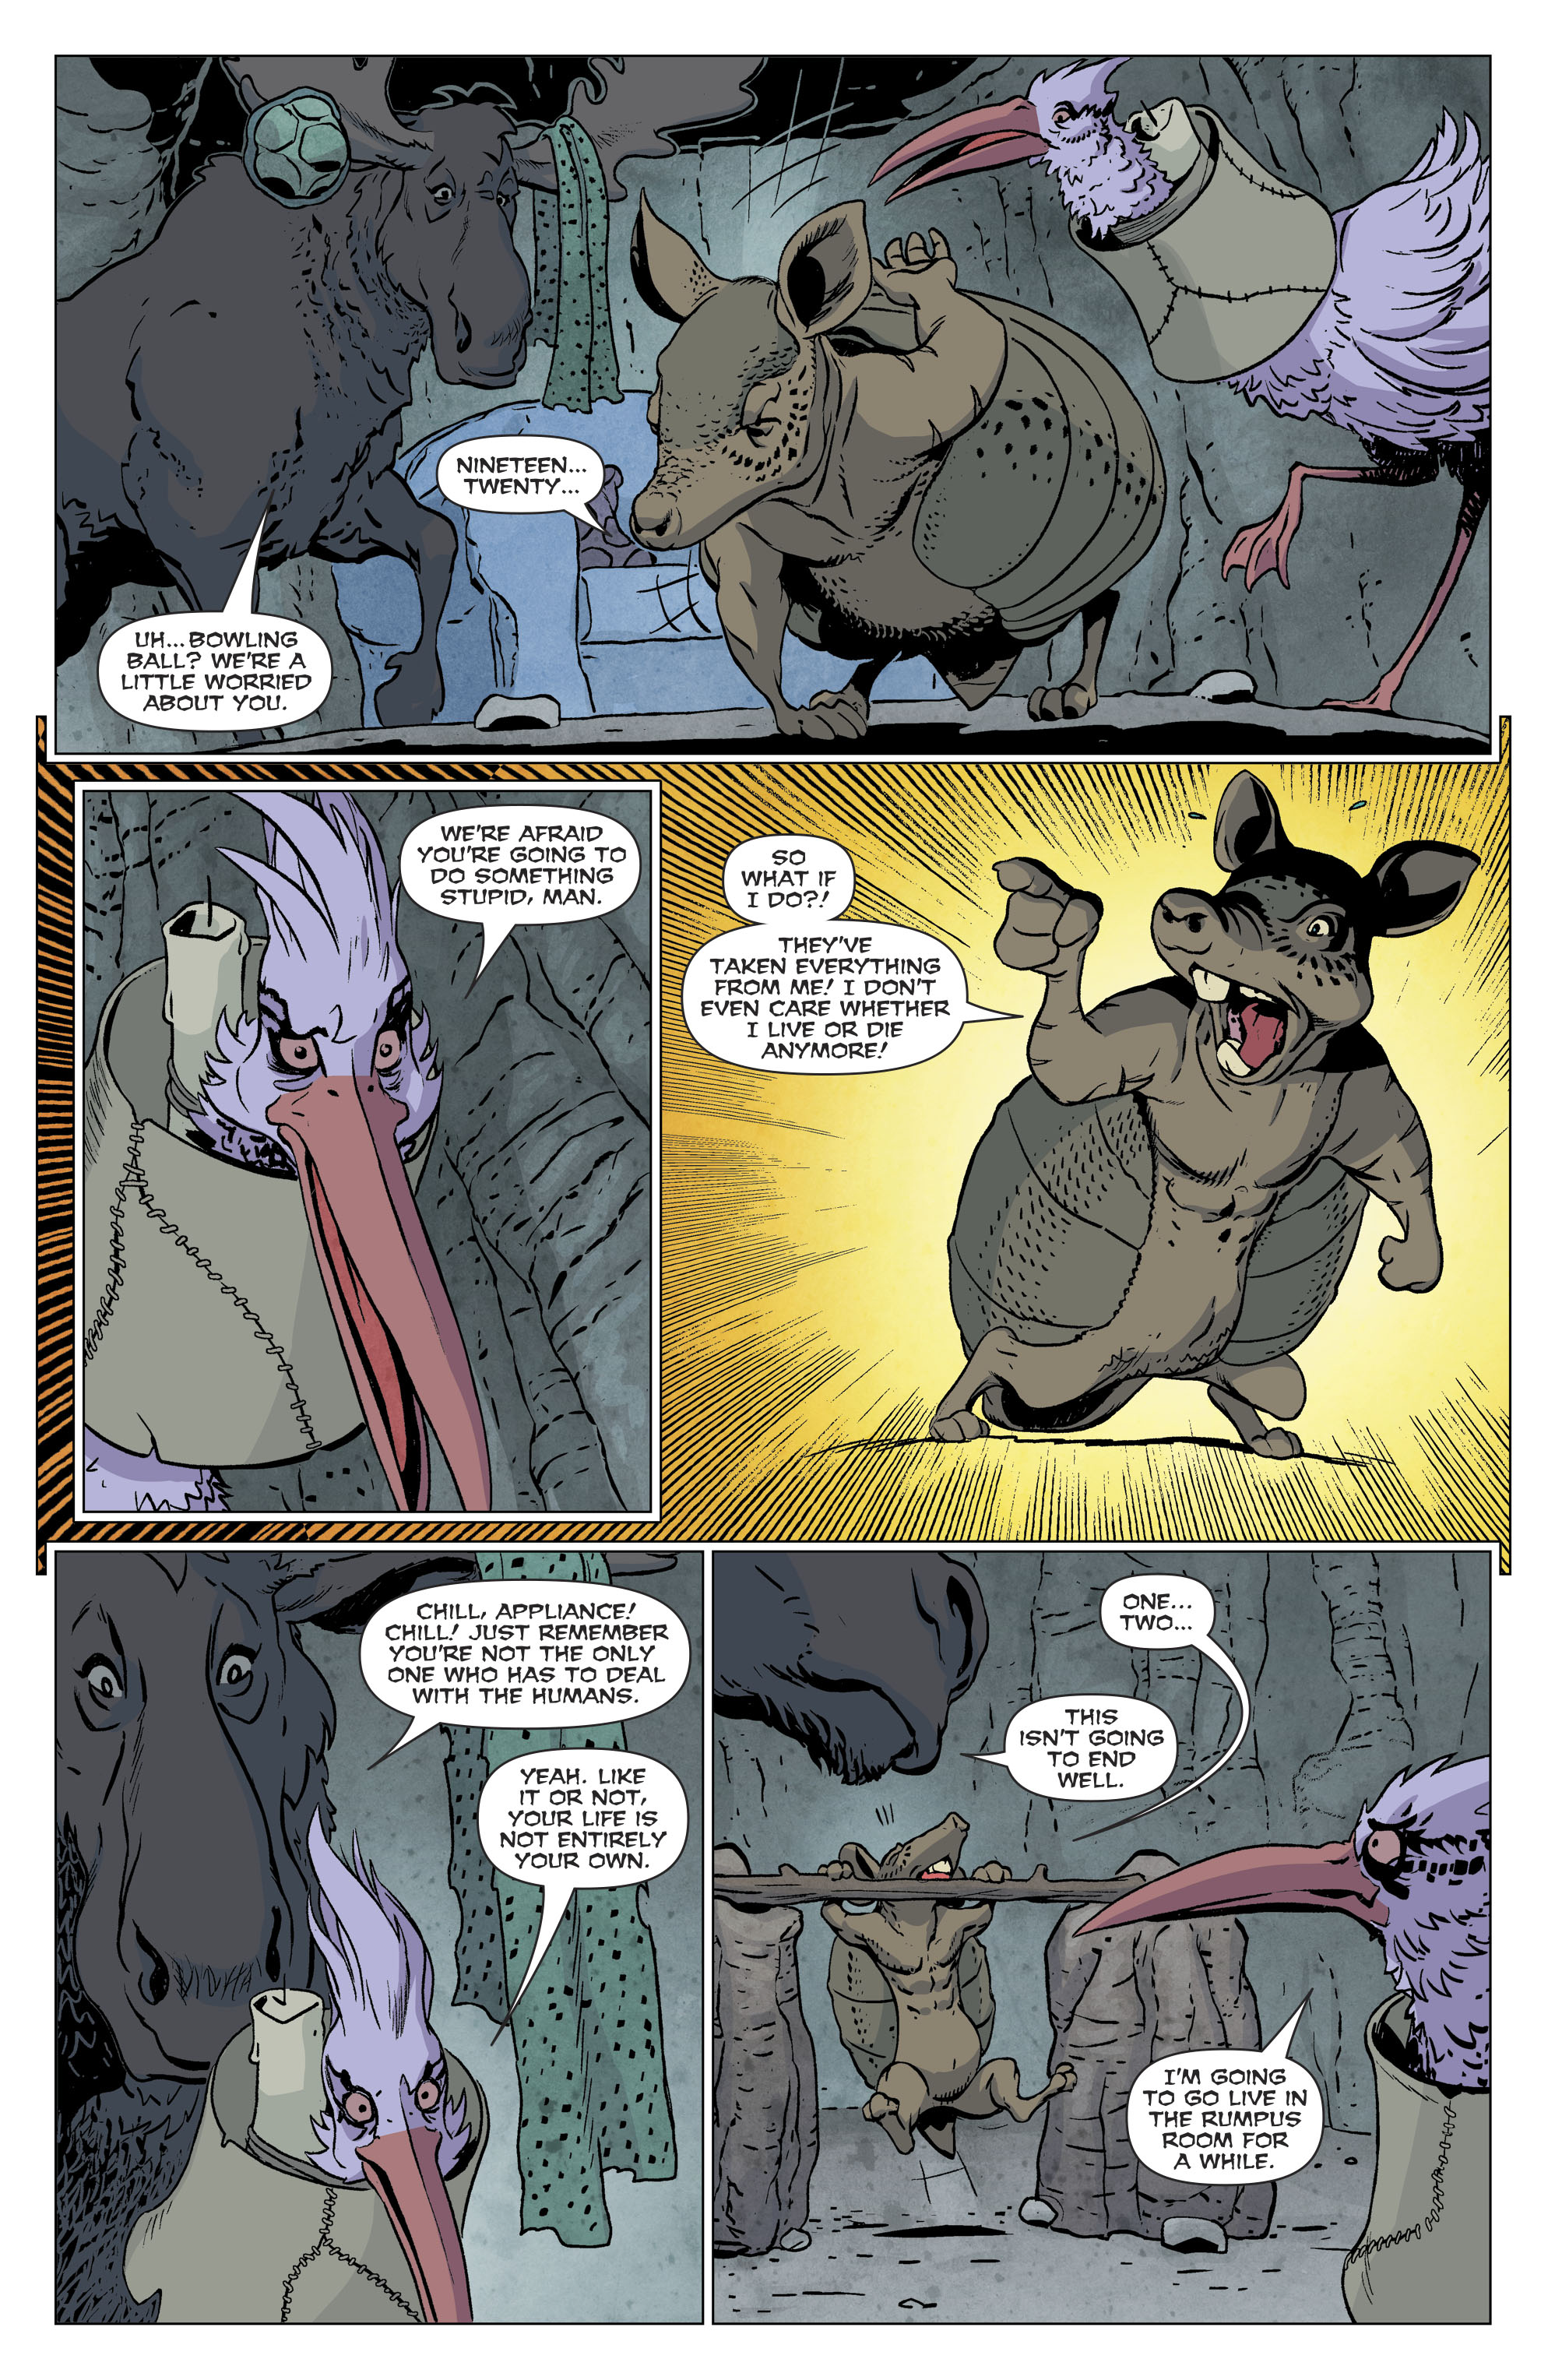 Read online The Flintstones comic -  Issue #12 - 11